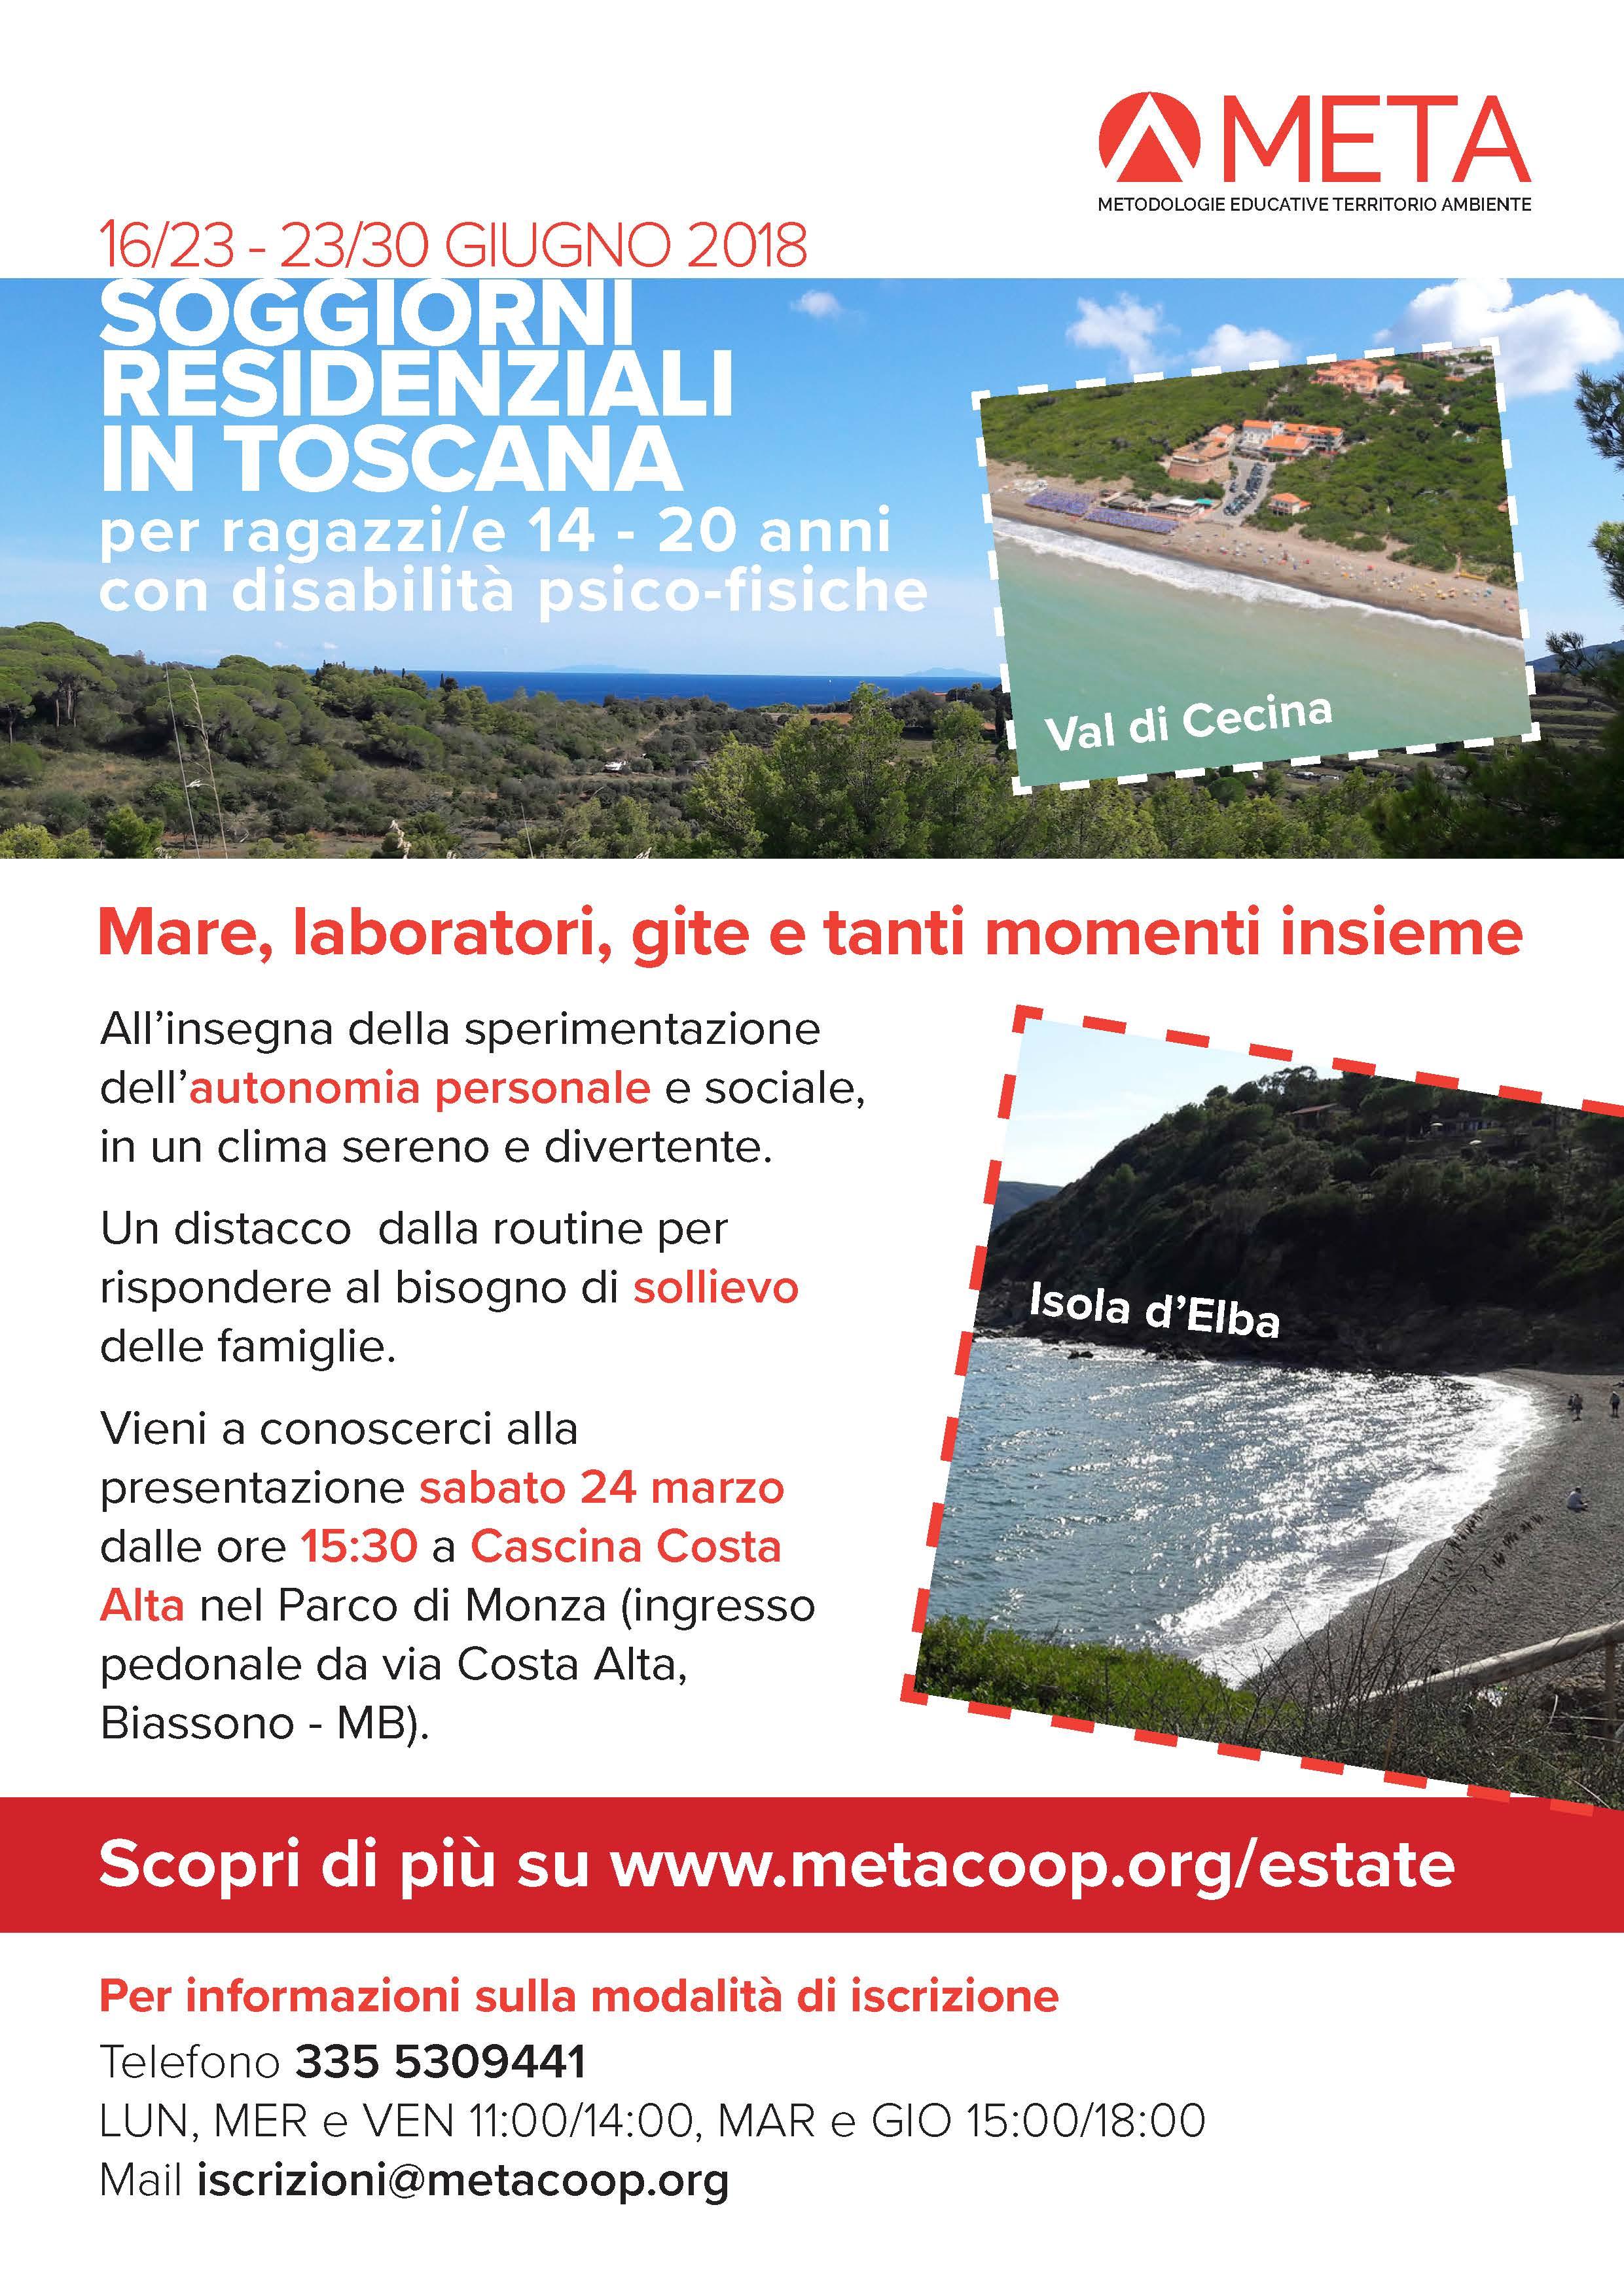 Vacanze al mare in Toscana 2018 - META